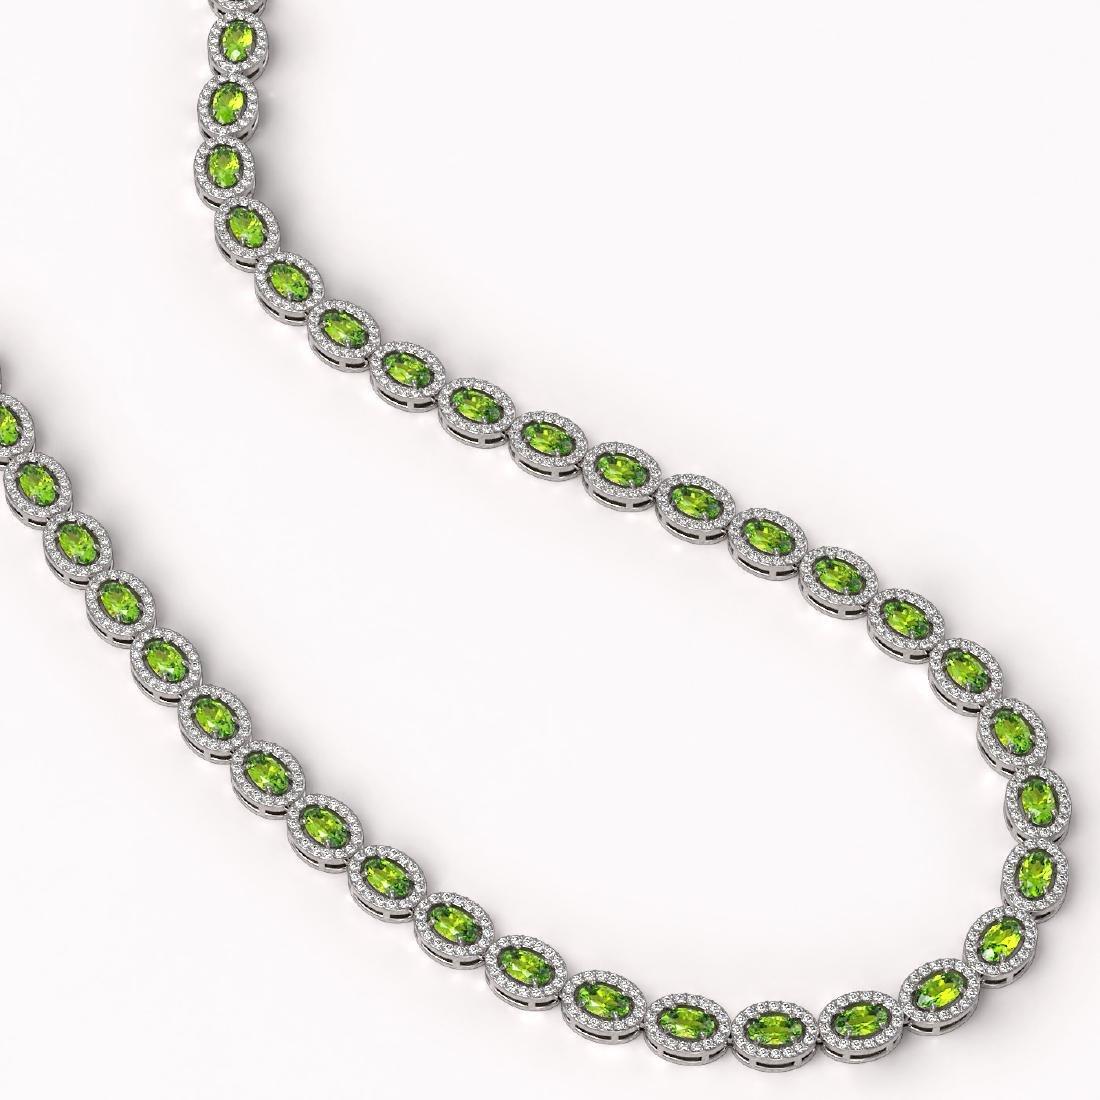 23.86 CTW Peridot & Diamond Halo Necklace 10K White - 2